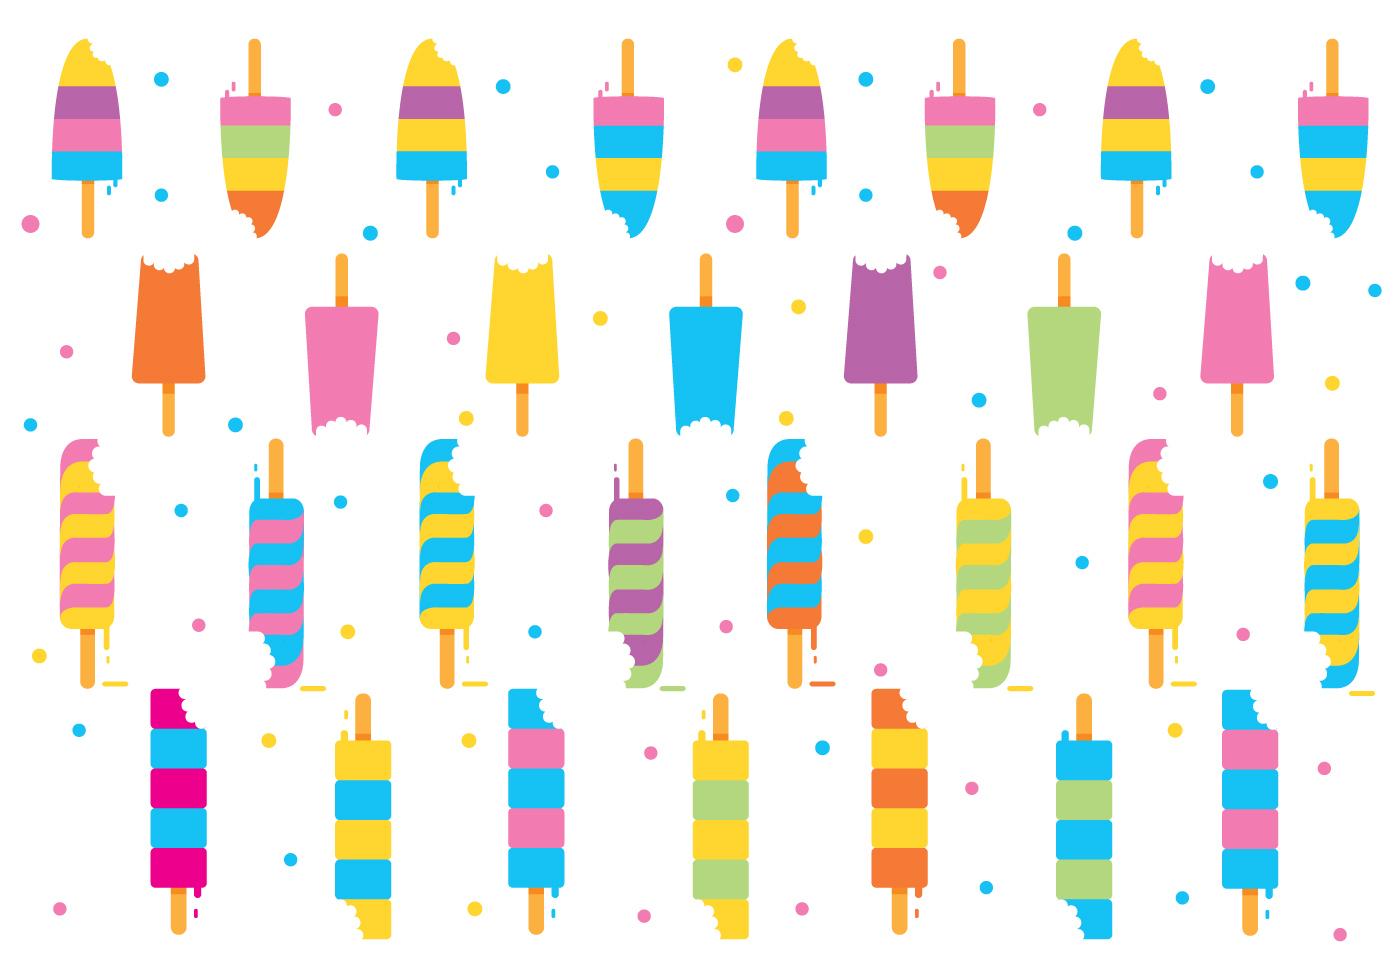 Cute Popsicle Wallpaper Pattern Bite Mark Ice Cream Vector Download Free Vector